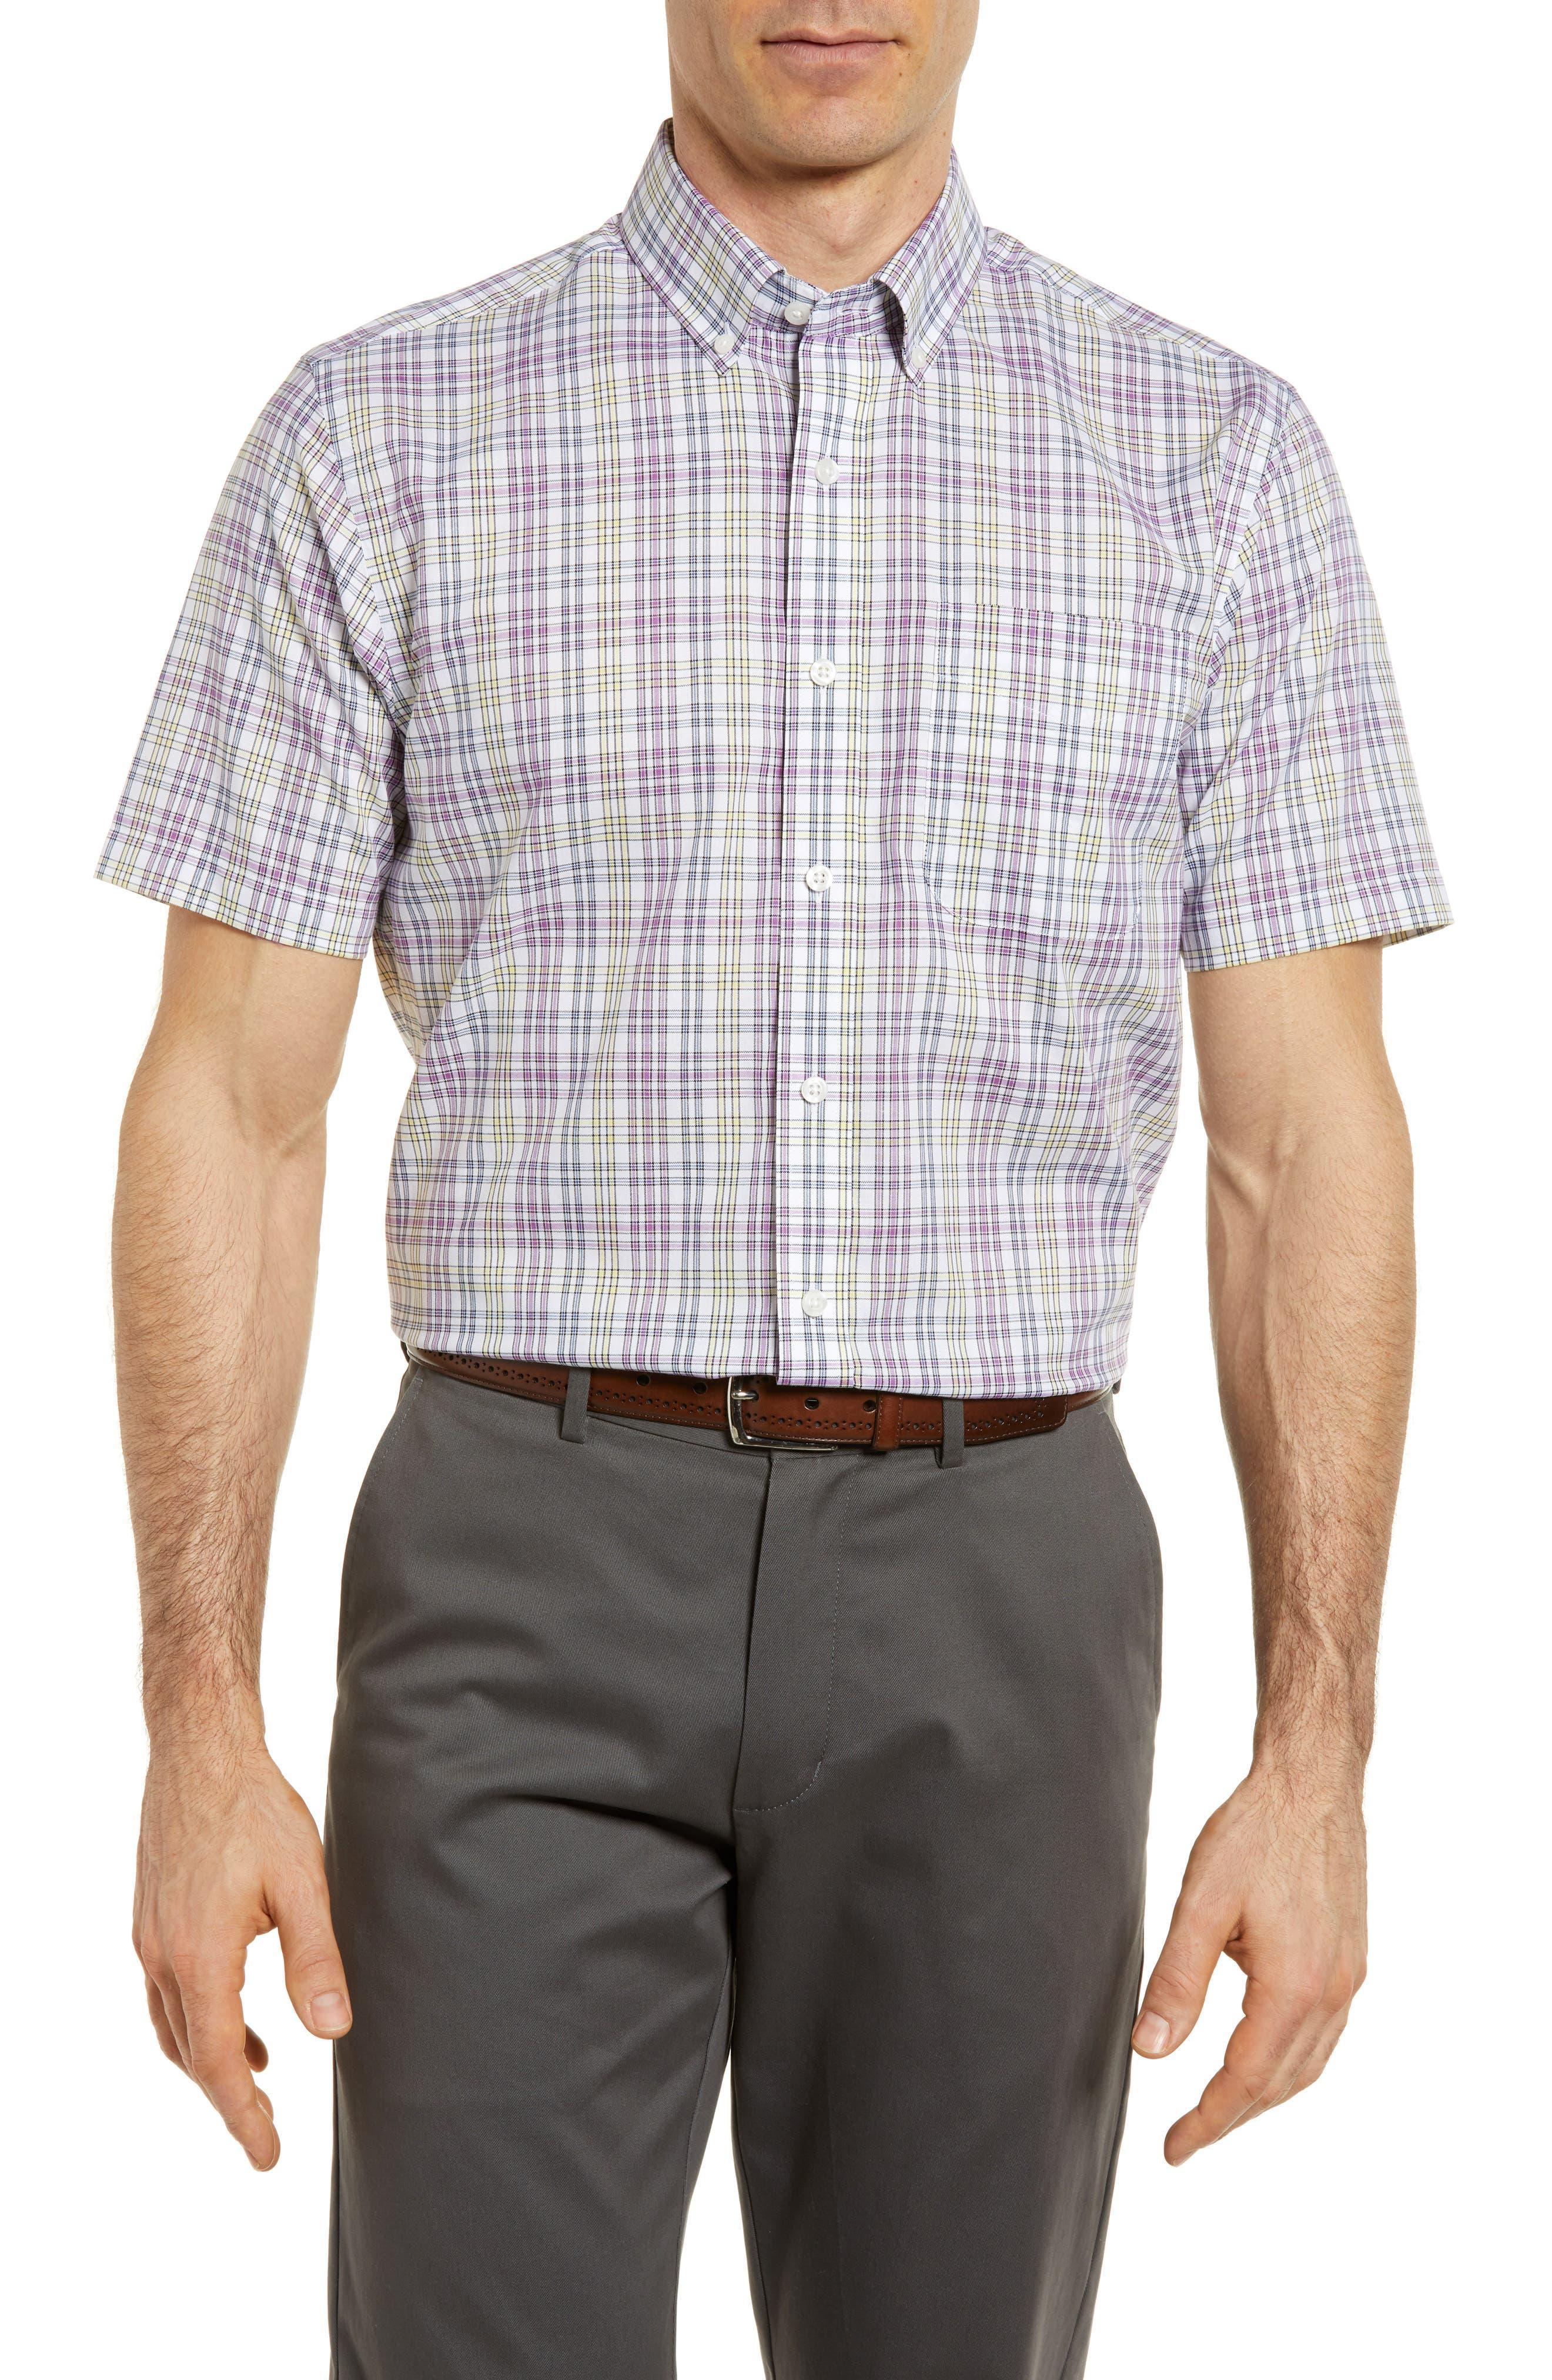 Isaac Plaid Easy Care Woven Shirt,                             Main thumbnail 1, color,                             Magnetic